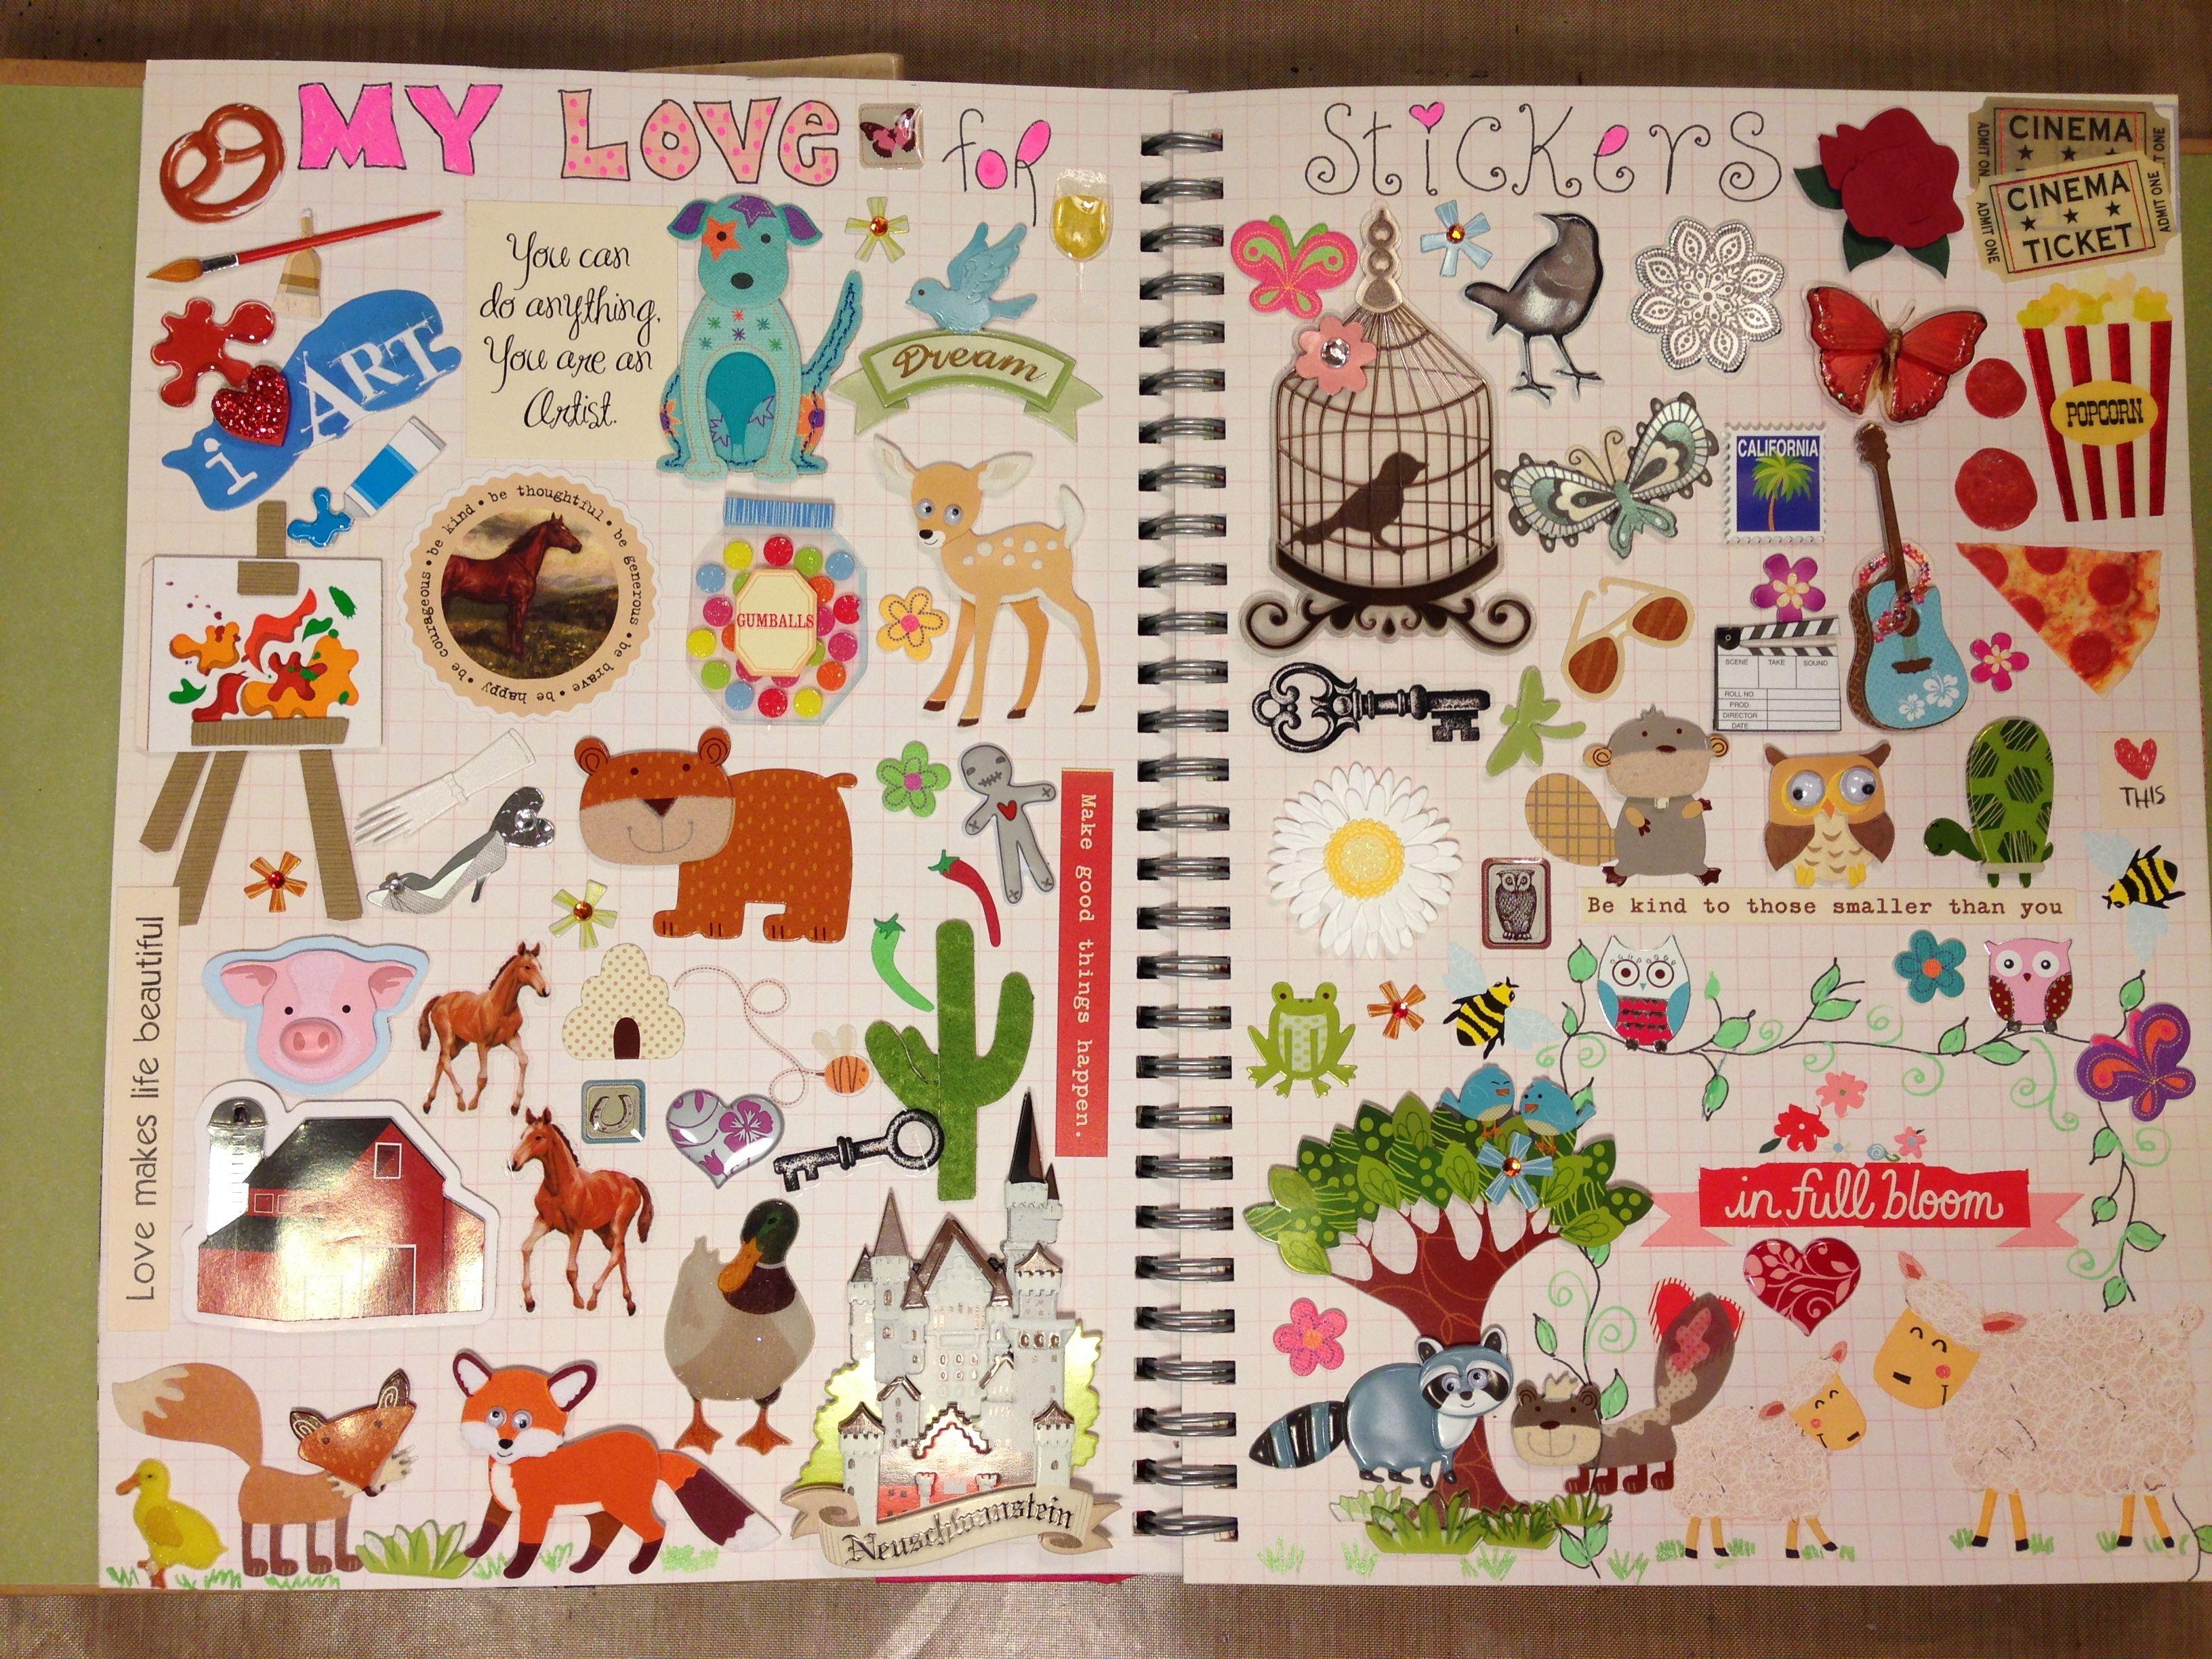 Scrapbook notebook ideas - Scrapbook Paper Marions Smash Book Sticker Page Fun Good Idea To Dedicate Page